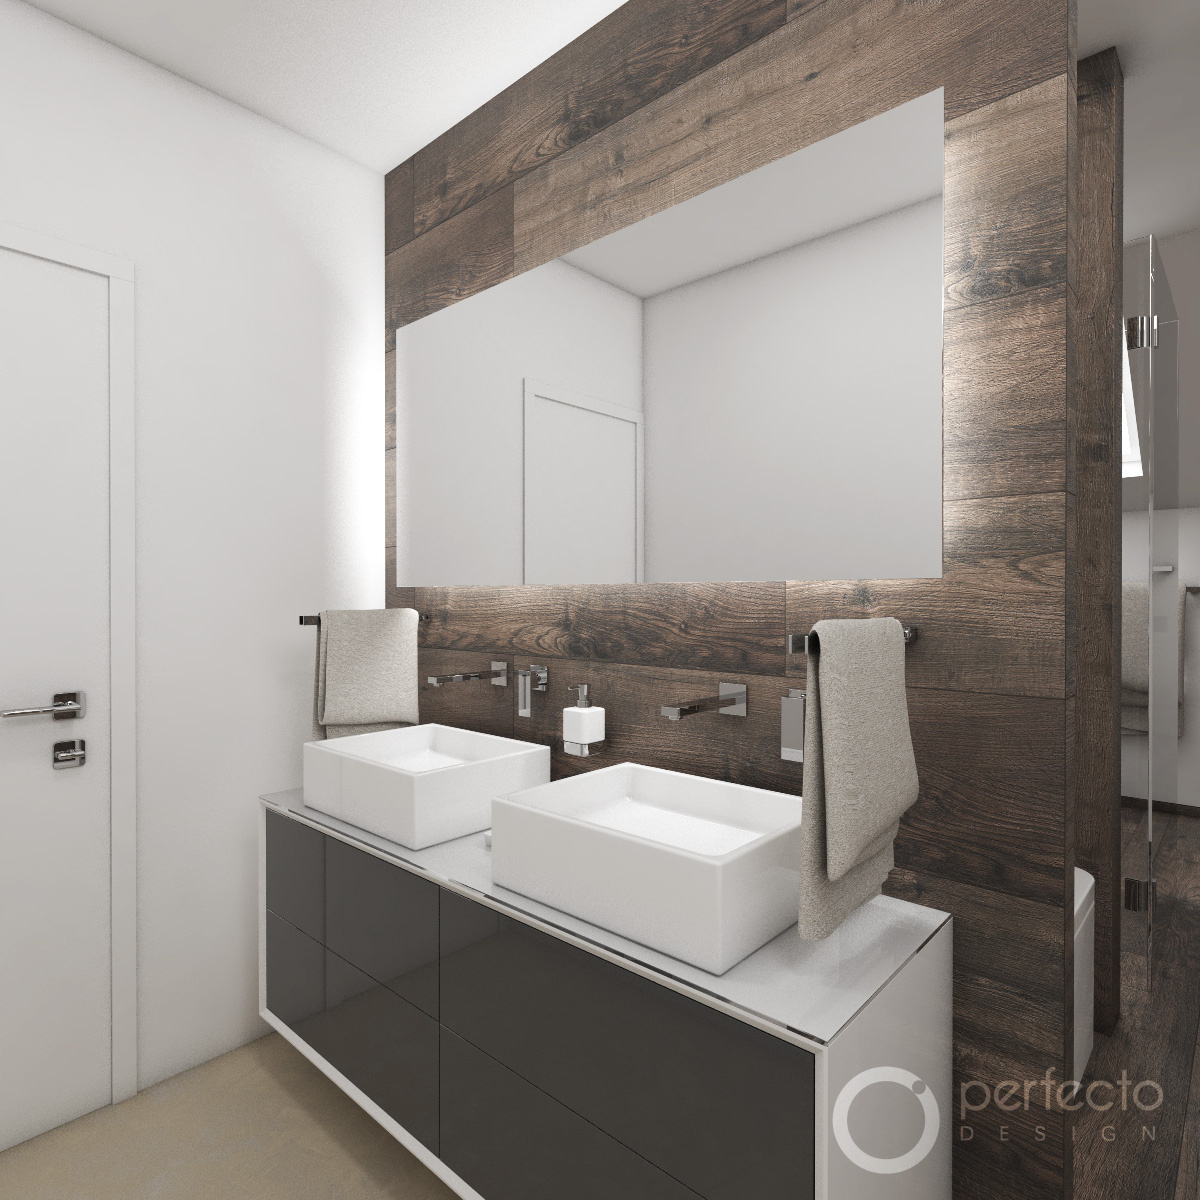 Moderne badezimmer resort perfecto design for Moderne badezimmer beleuchtung